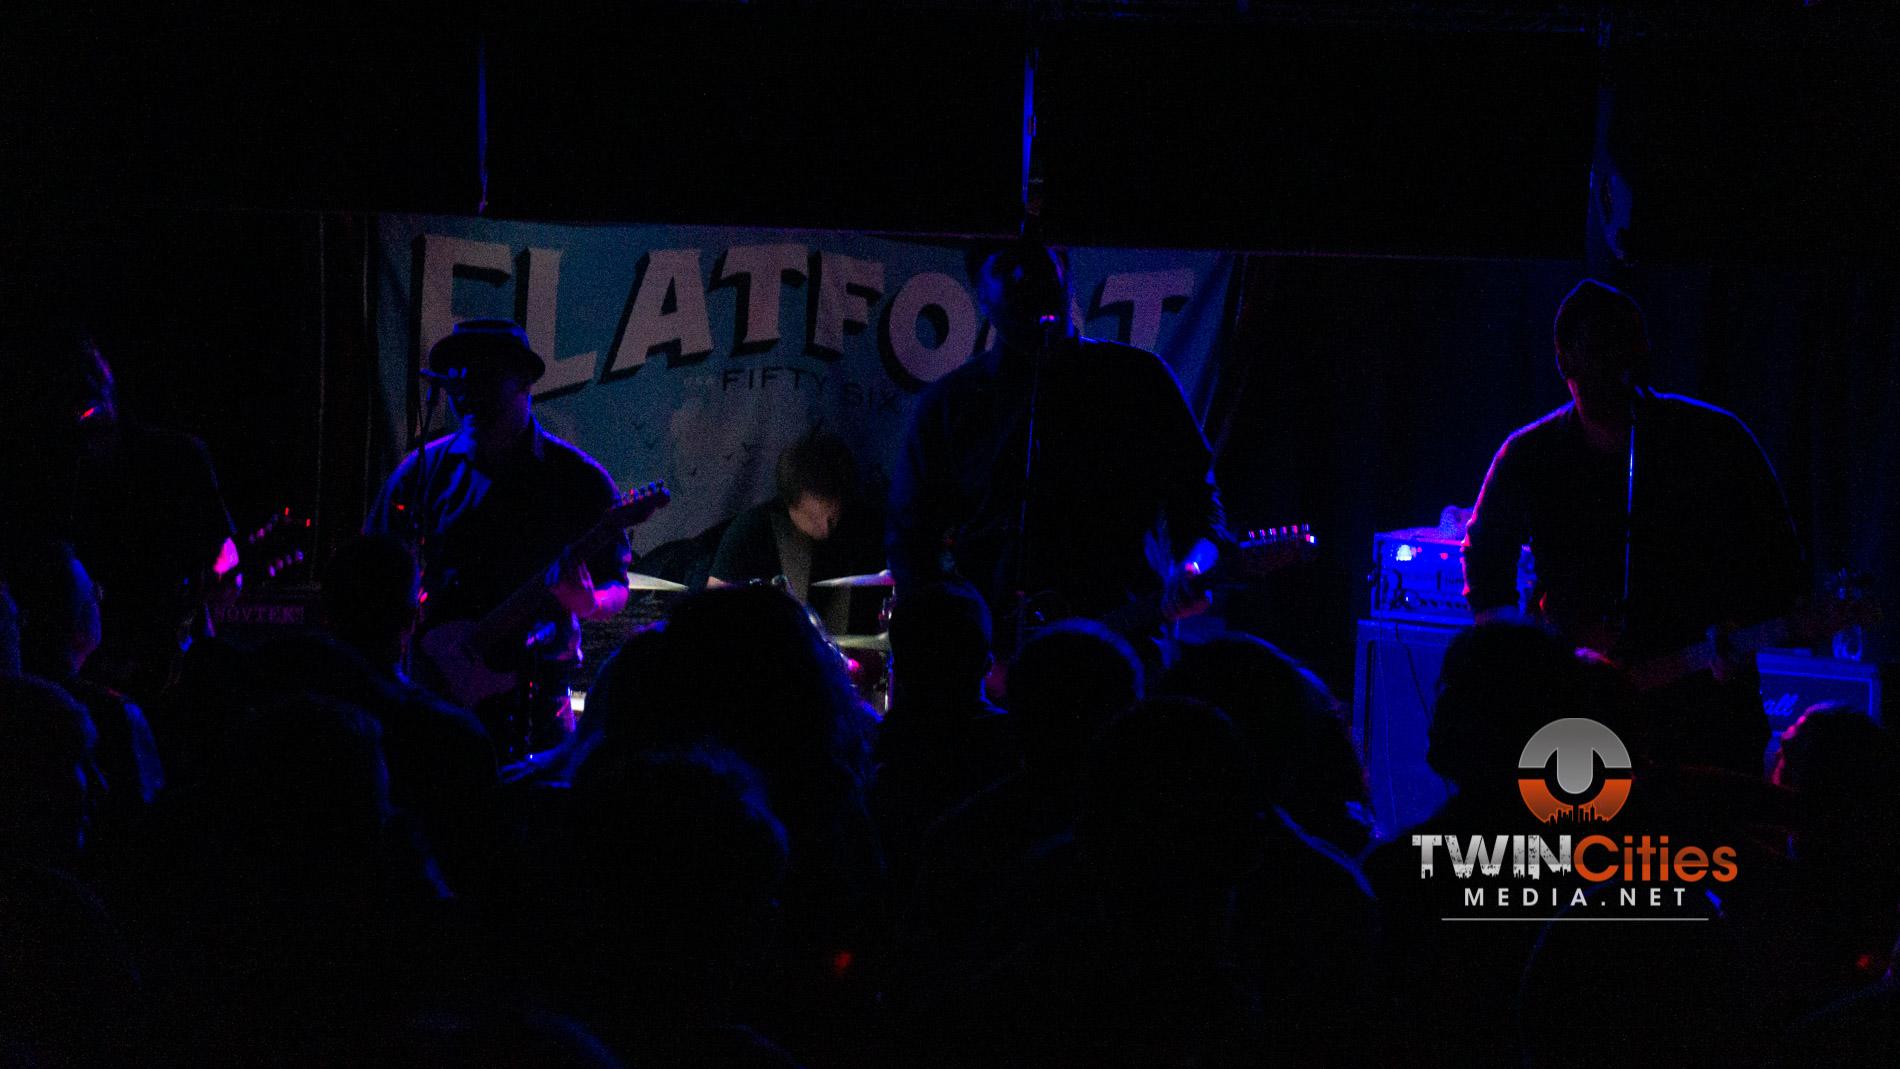 Flatfoot-4